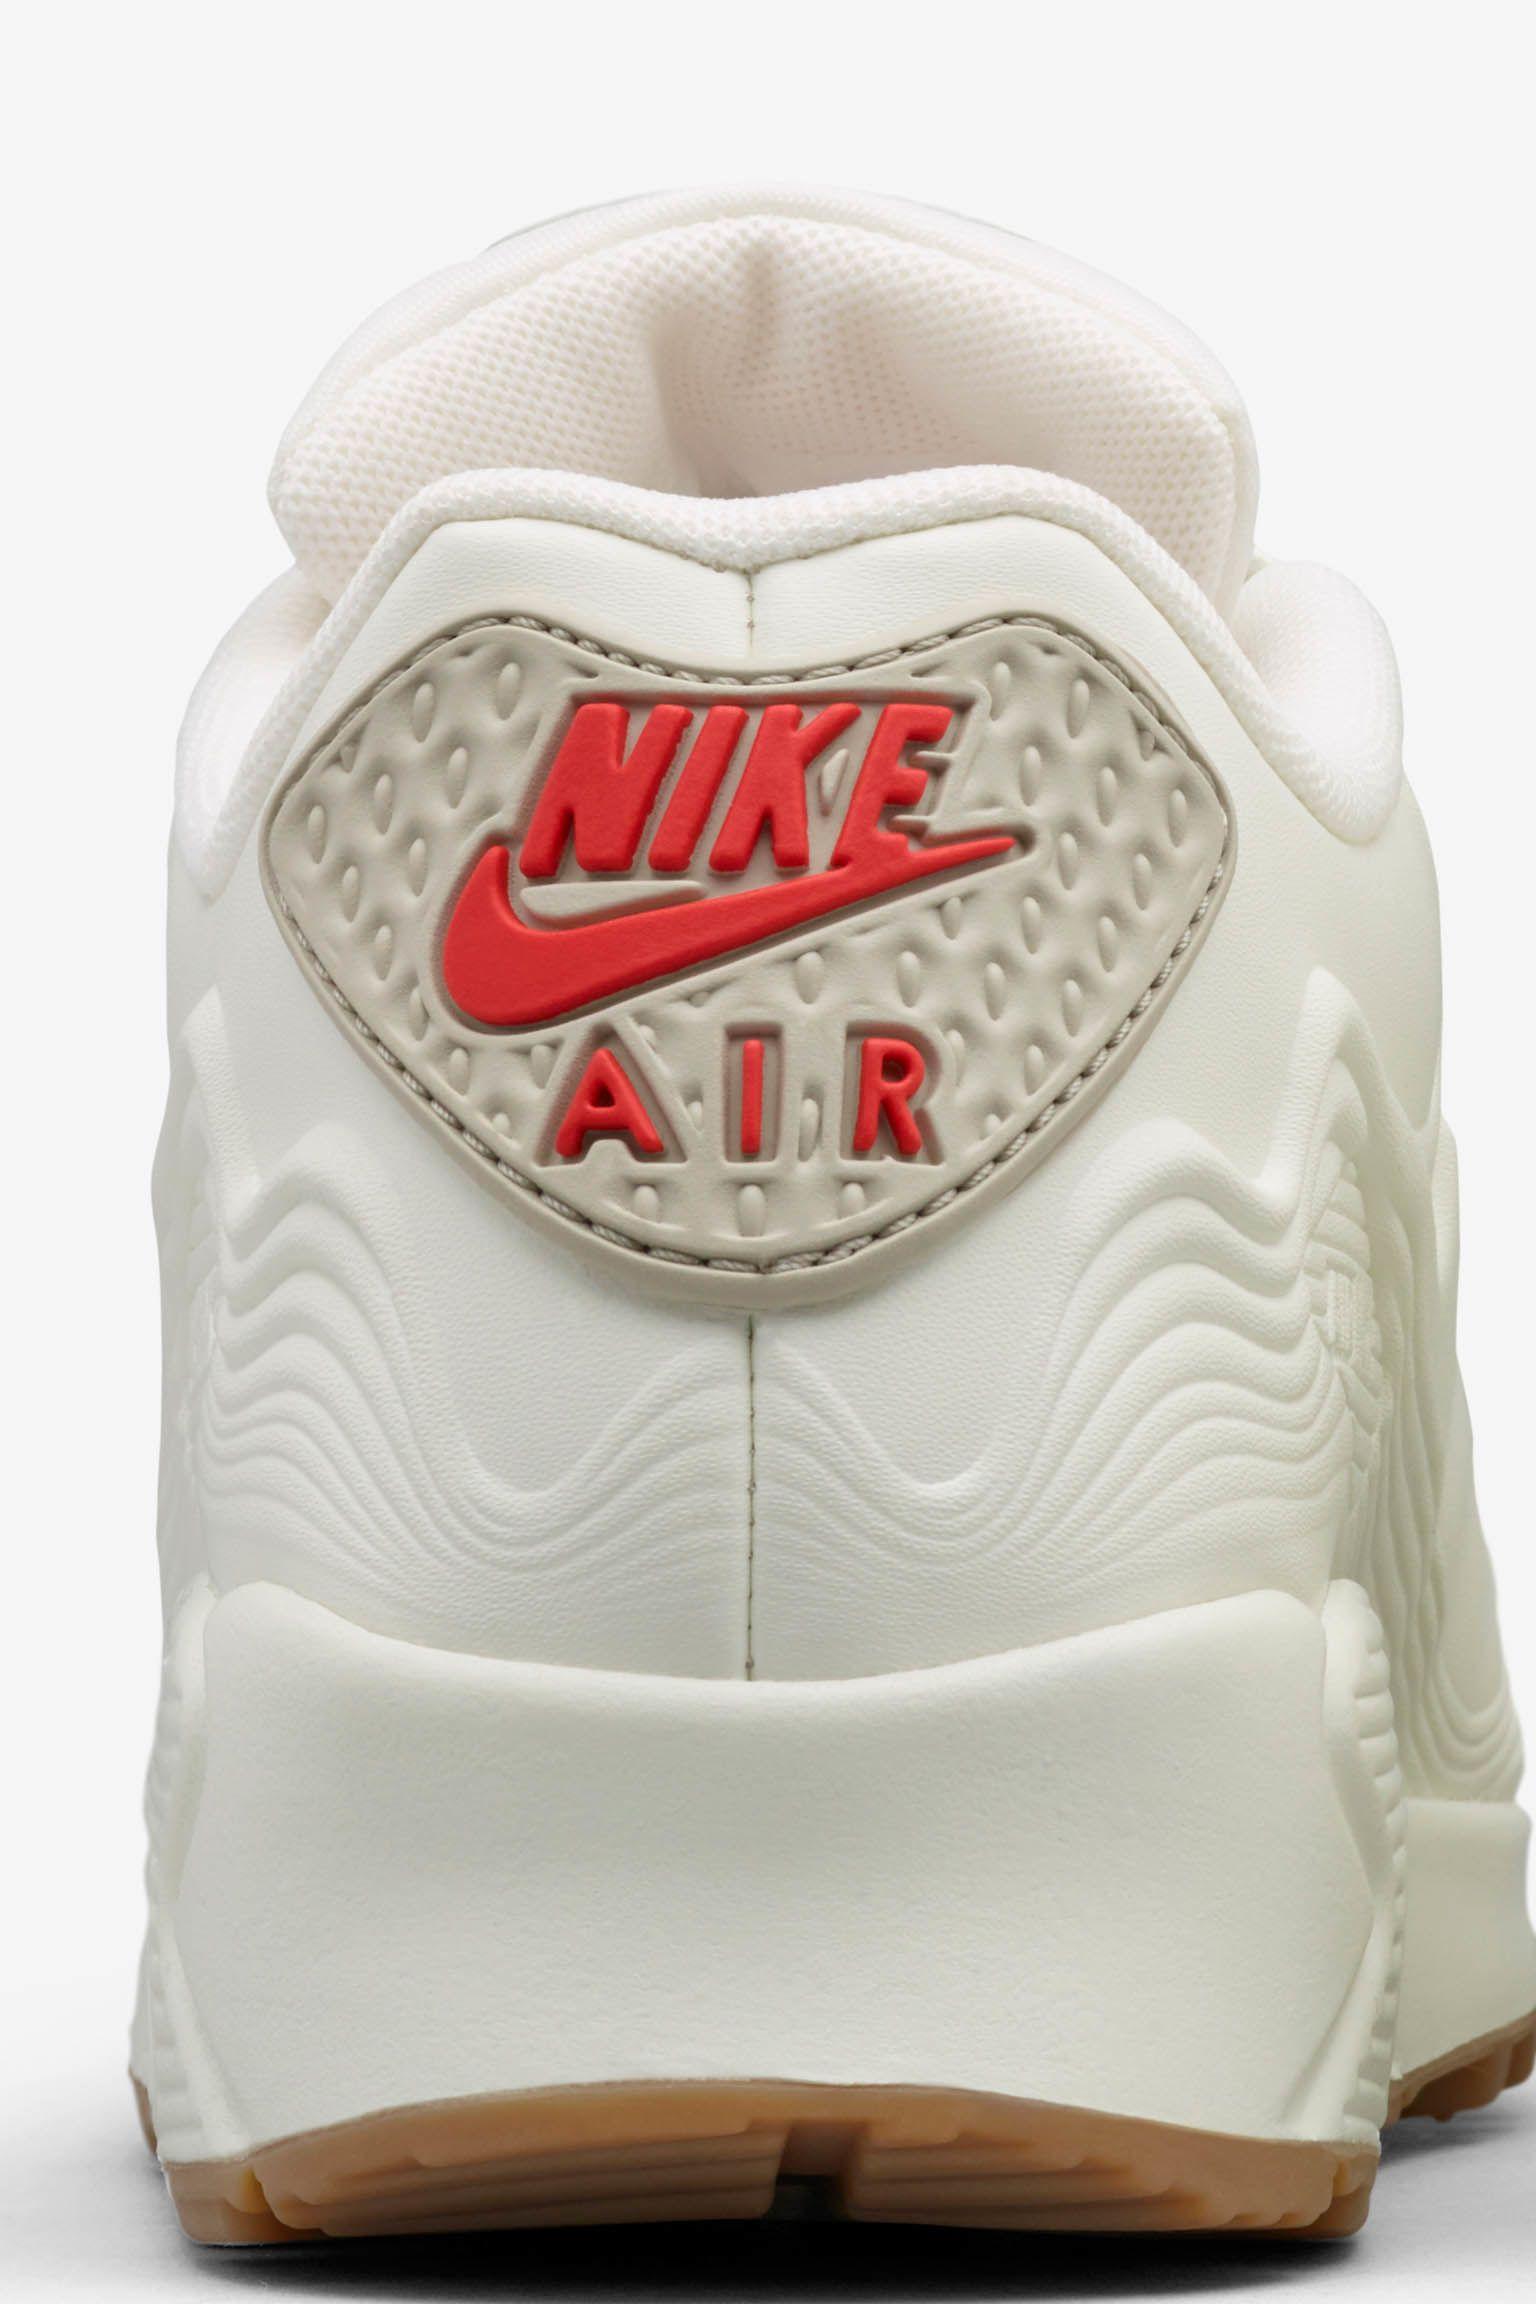 Women's Nike Air Max 90 'Tokyo'. Nike SNKRS